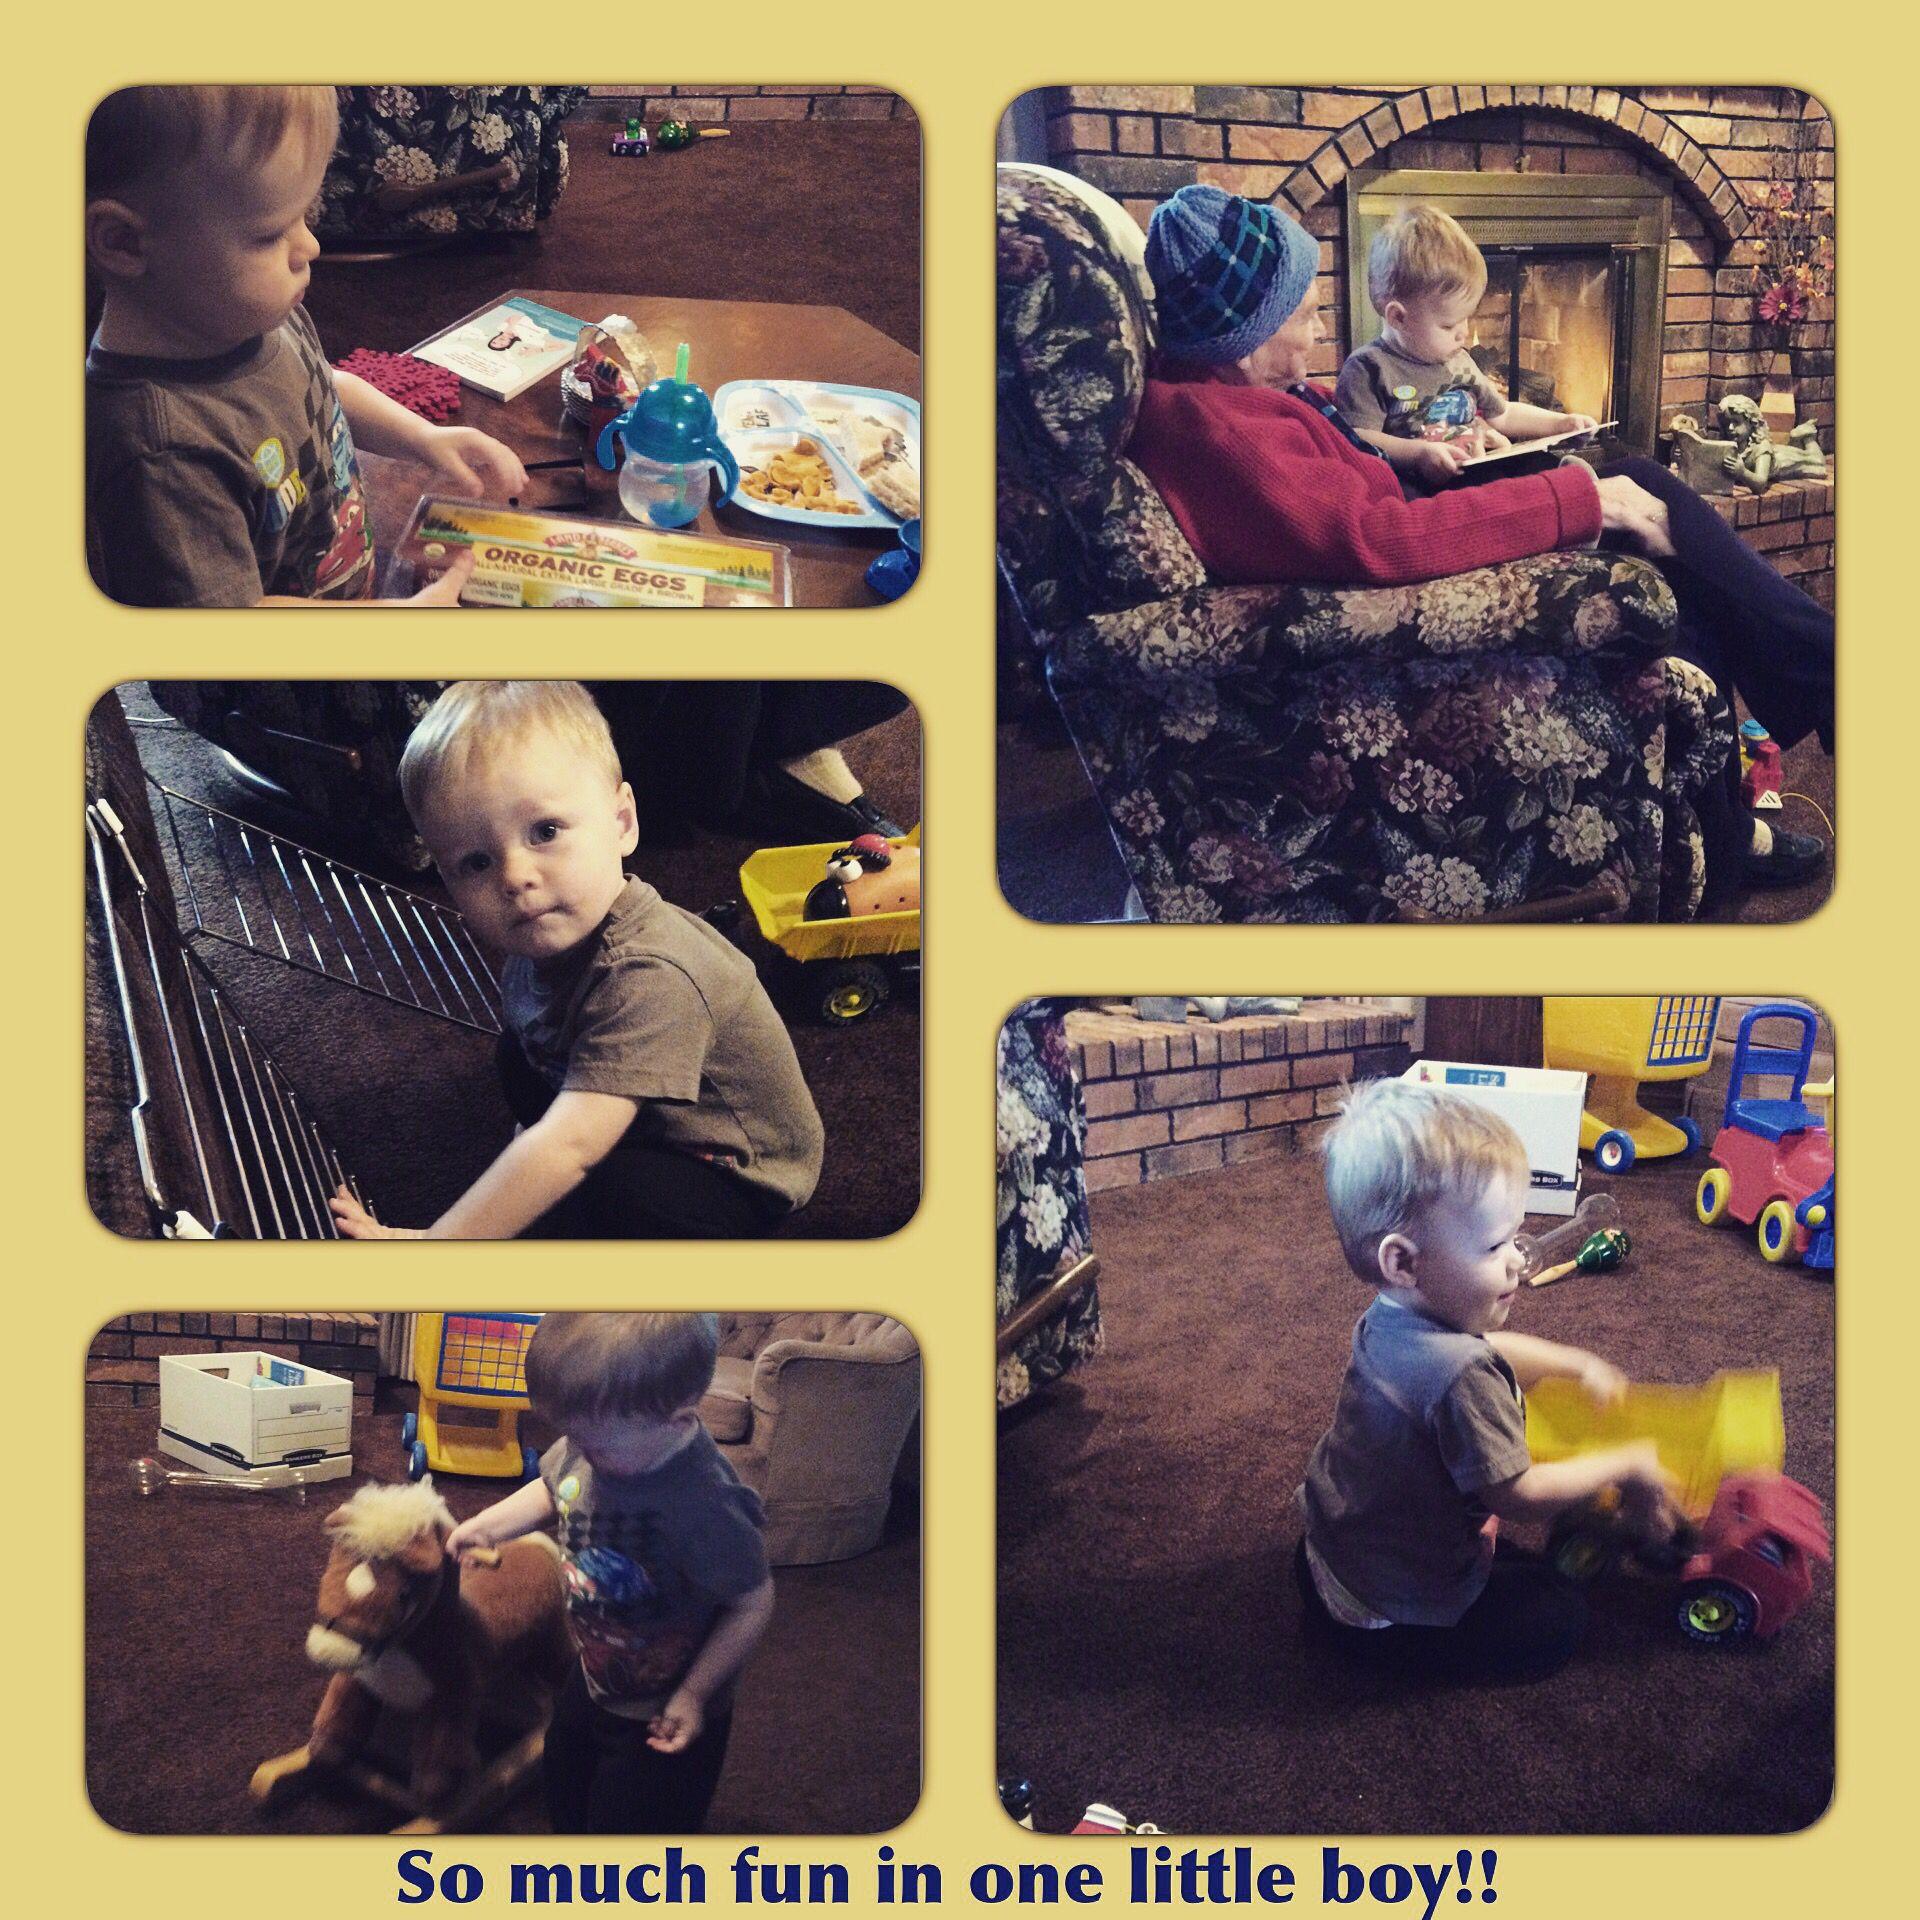 I love my grandson! Being blessed with precious memories..  #grandma #grandson #grandparents #love #family #boys #toys #trucks #exploring #horses #reading #books